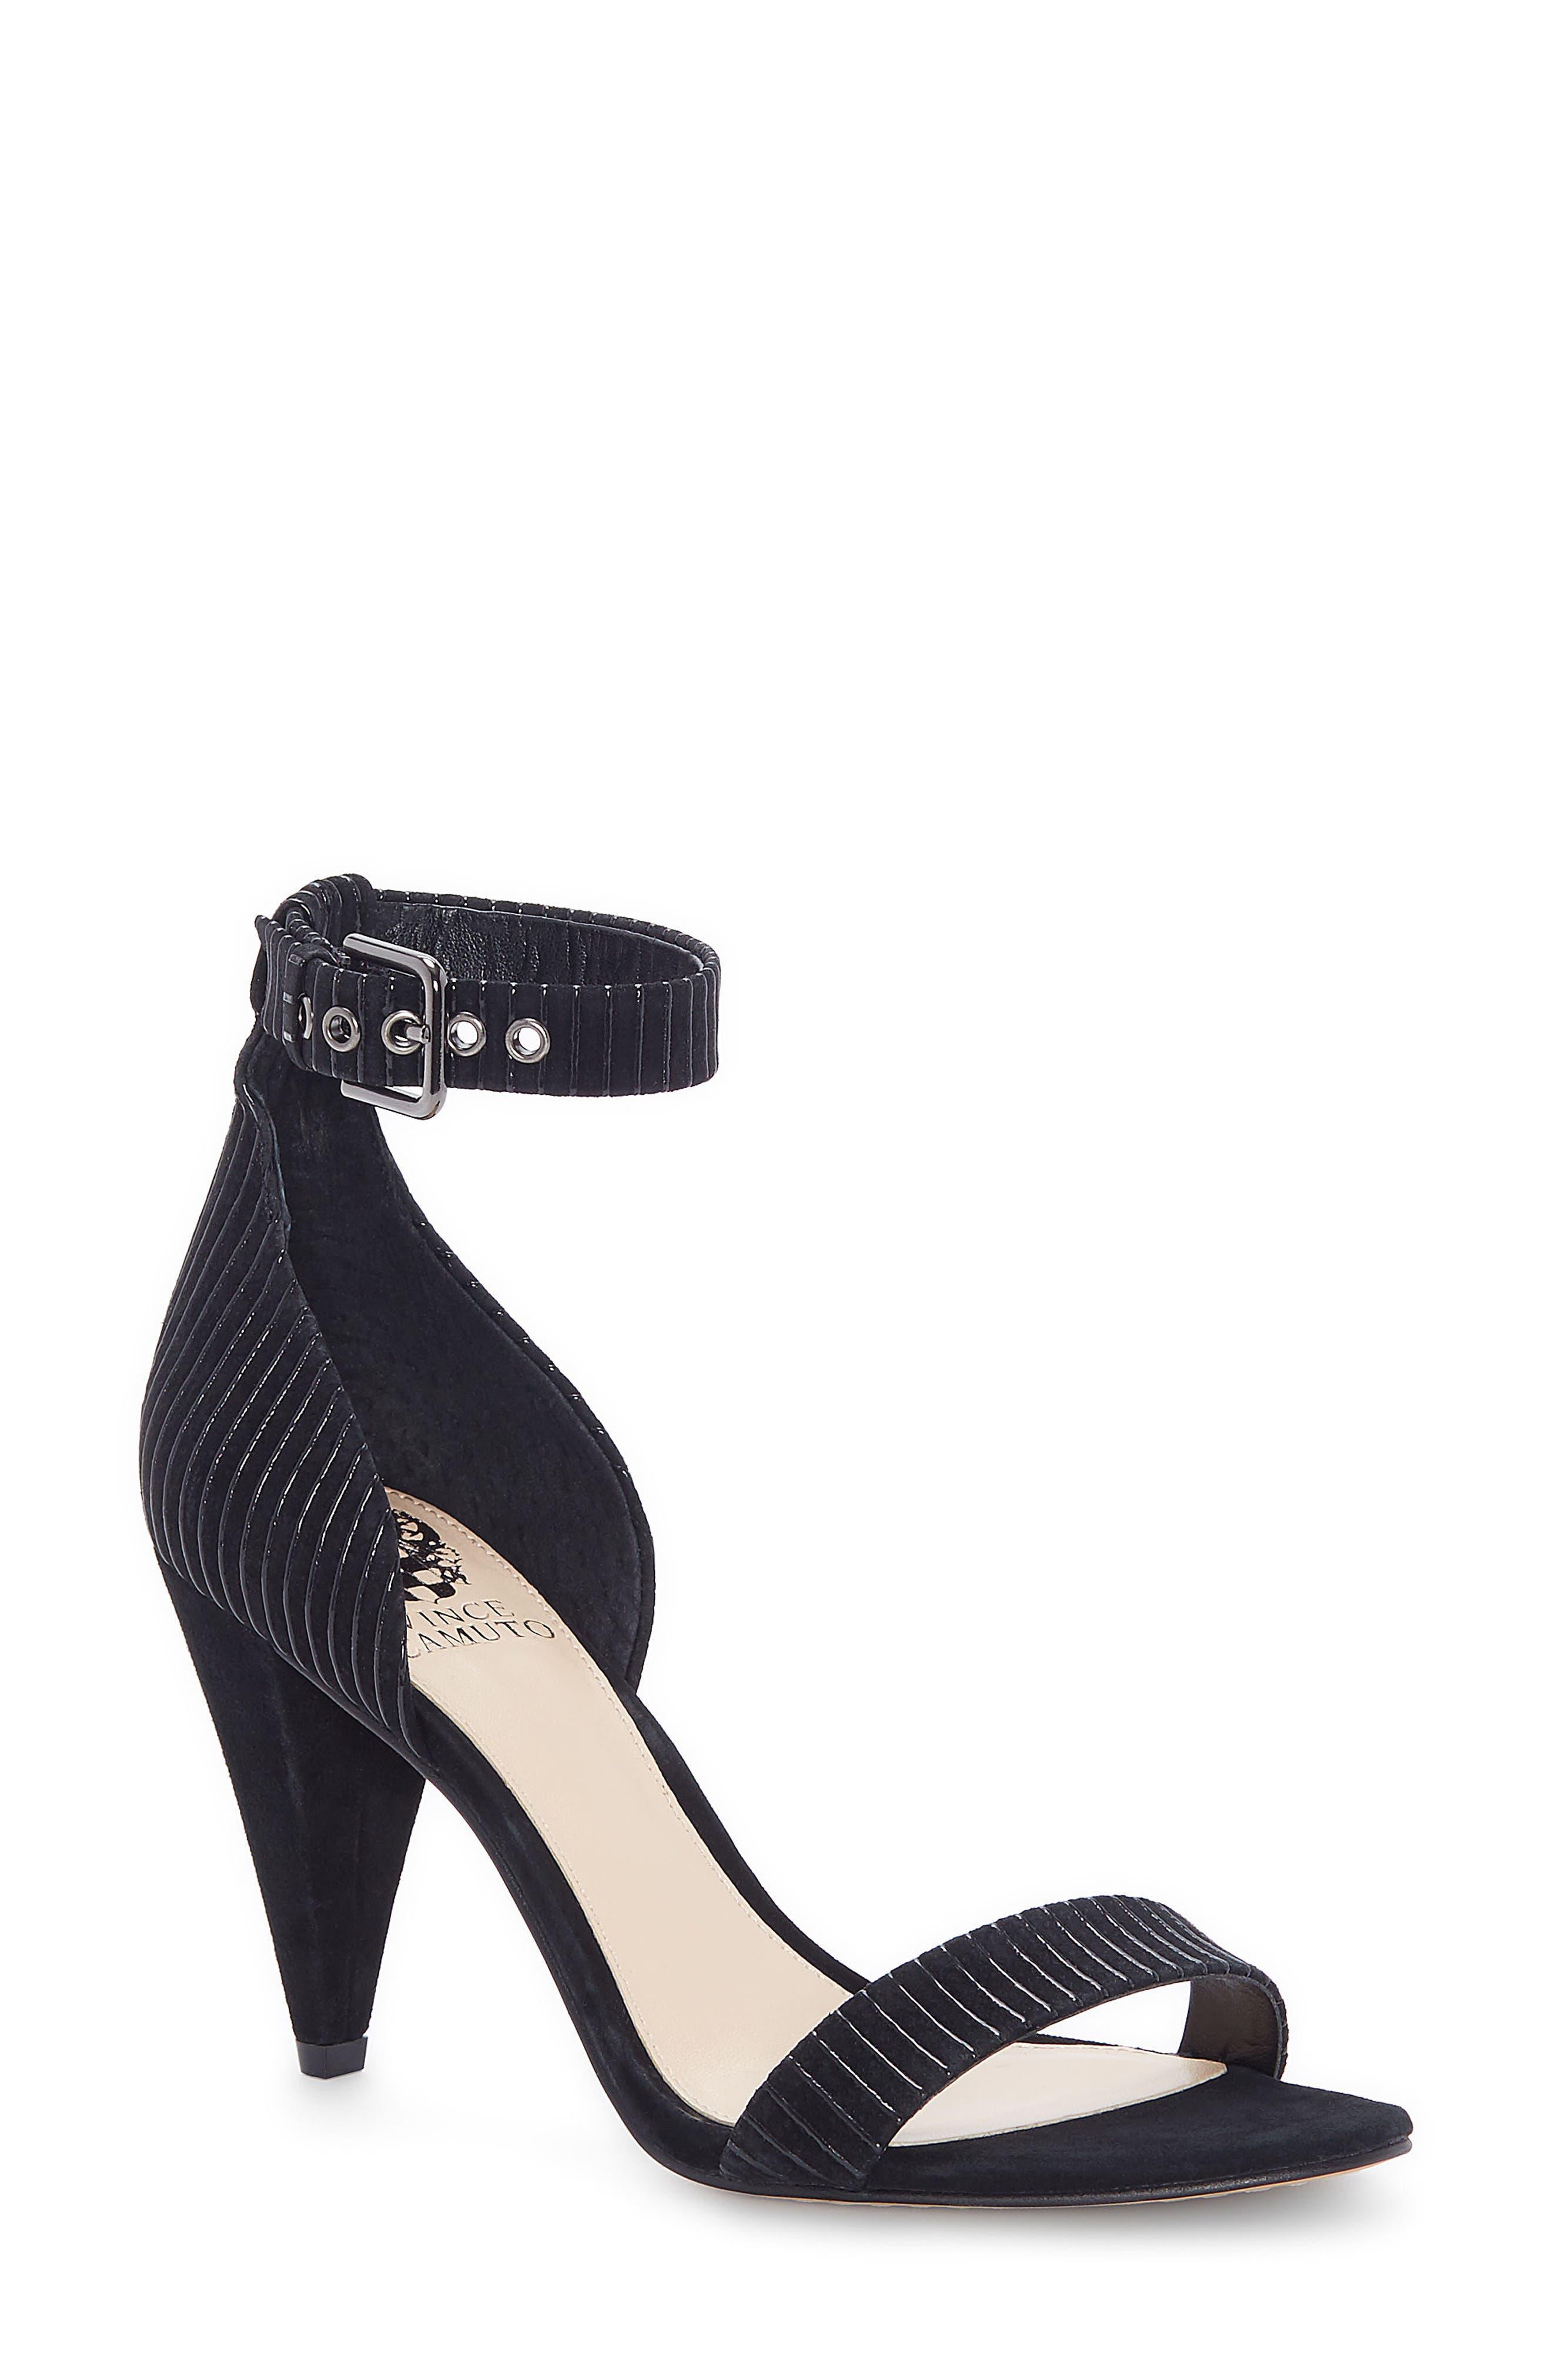 Cashane Sandal,                         Main,                         color, BLACK SUEDE